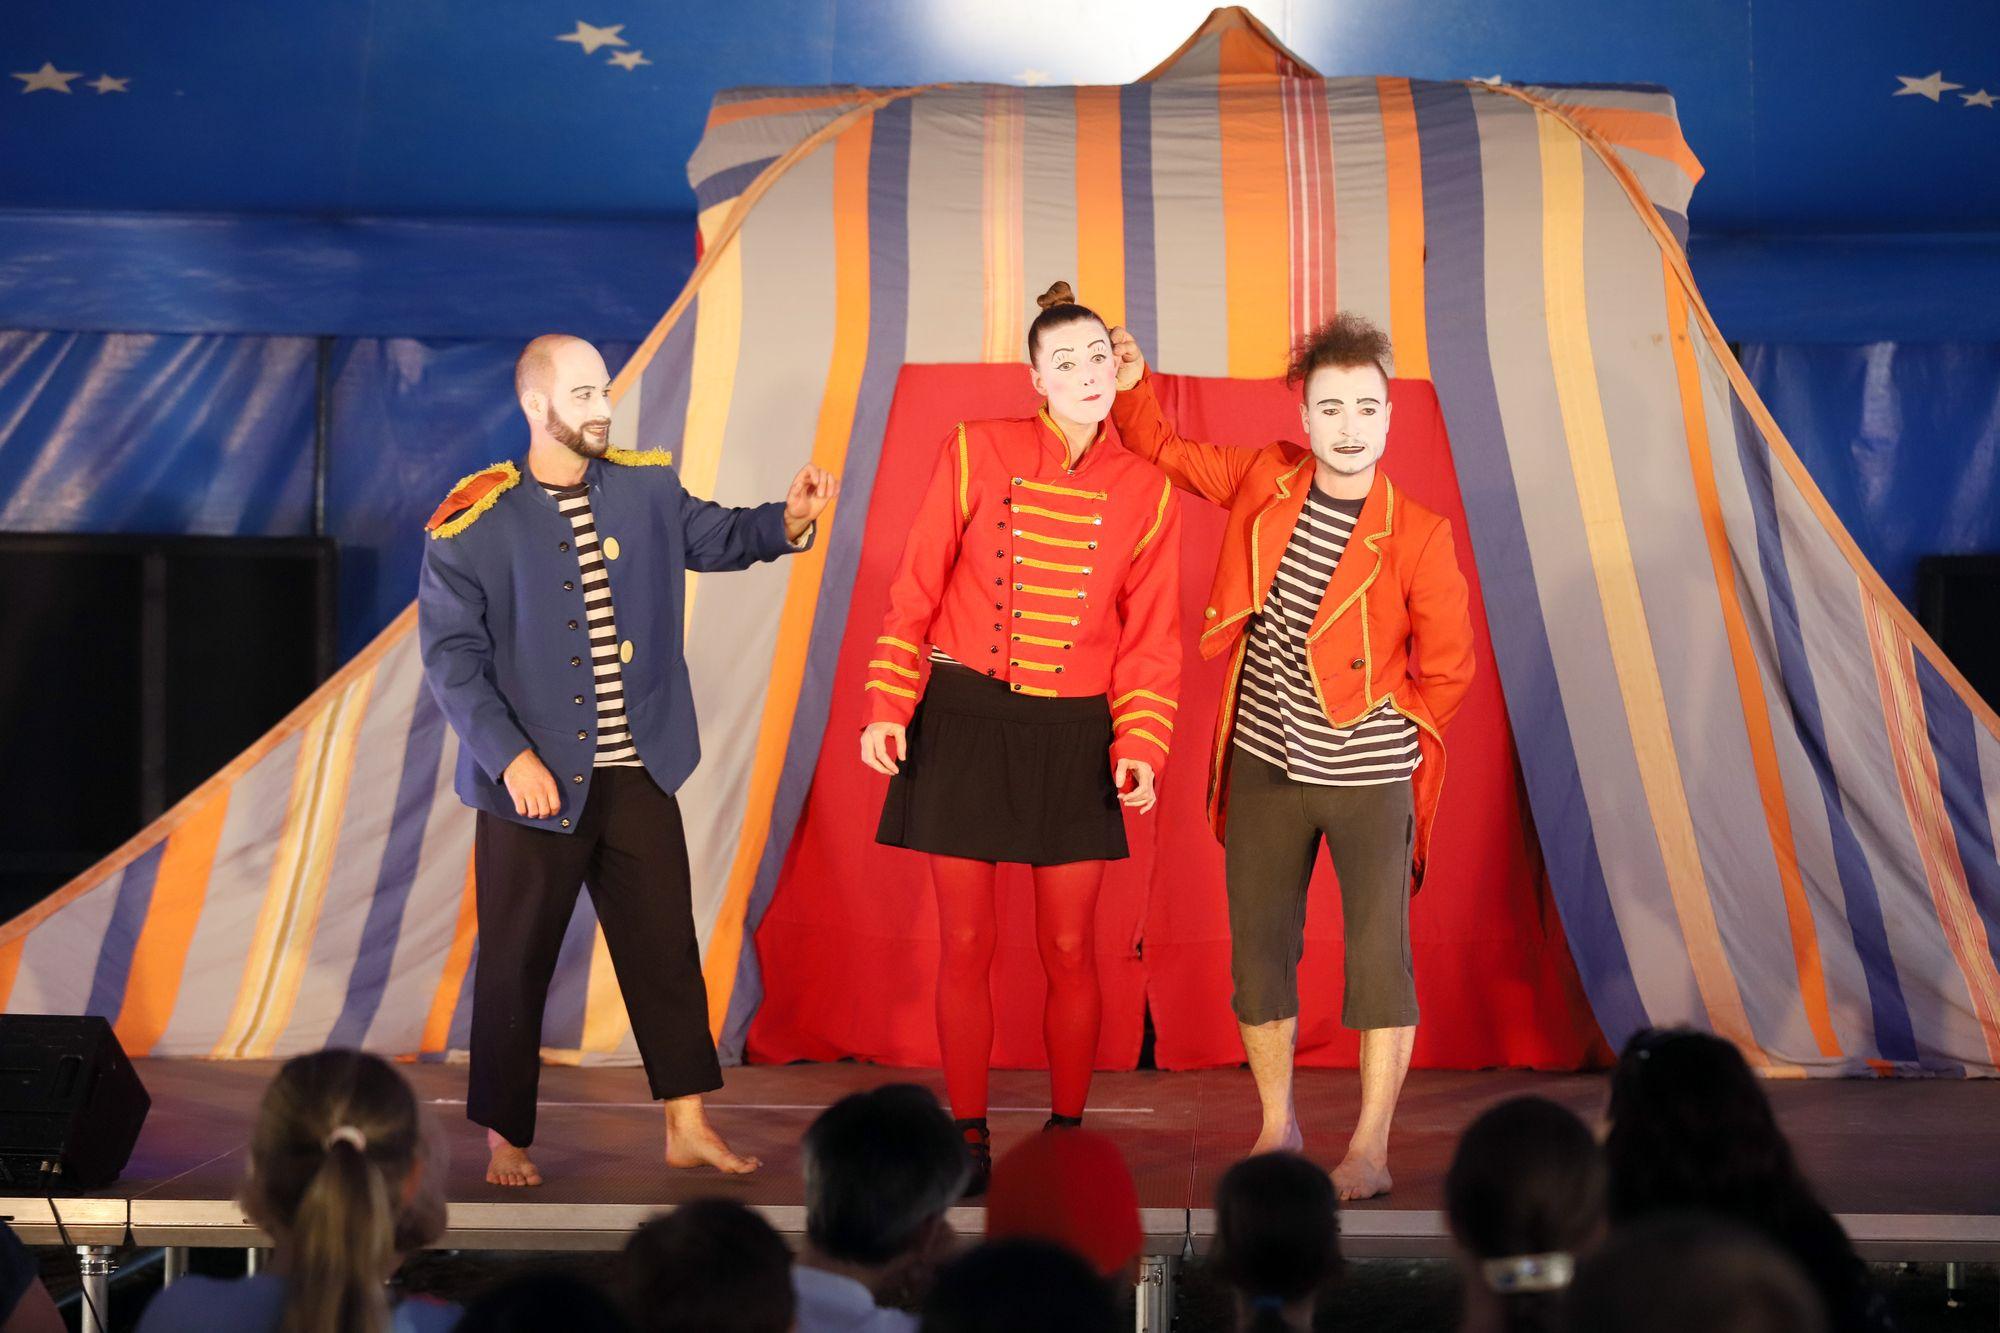 Teatro Piccolino: NEVIDITELNÝ CIRKUS | Komedianti v ulicích 2021 | Tábor